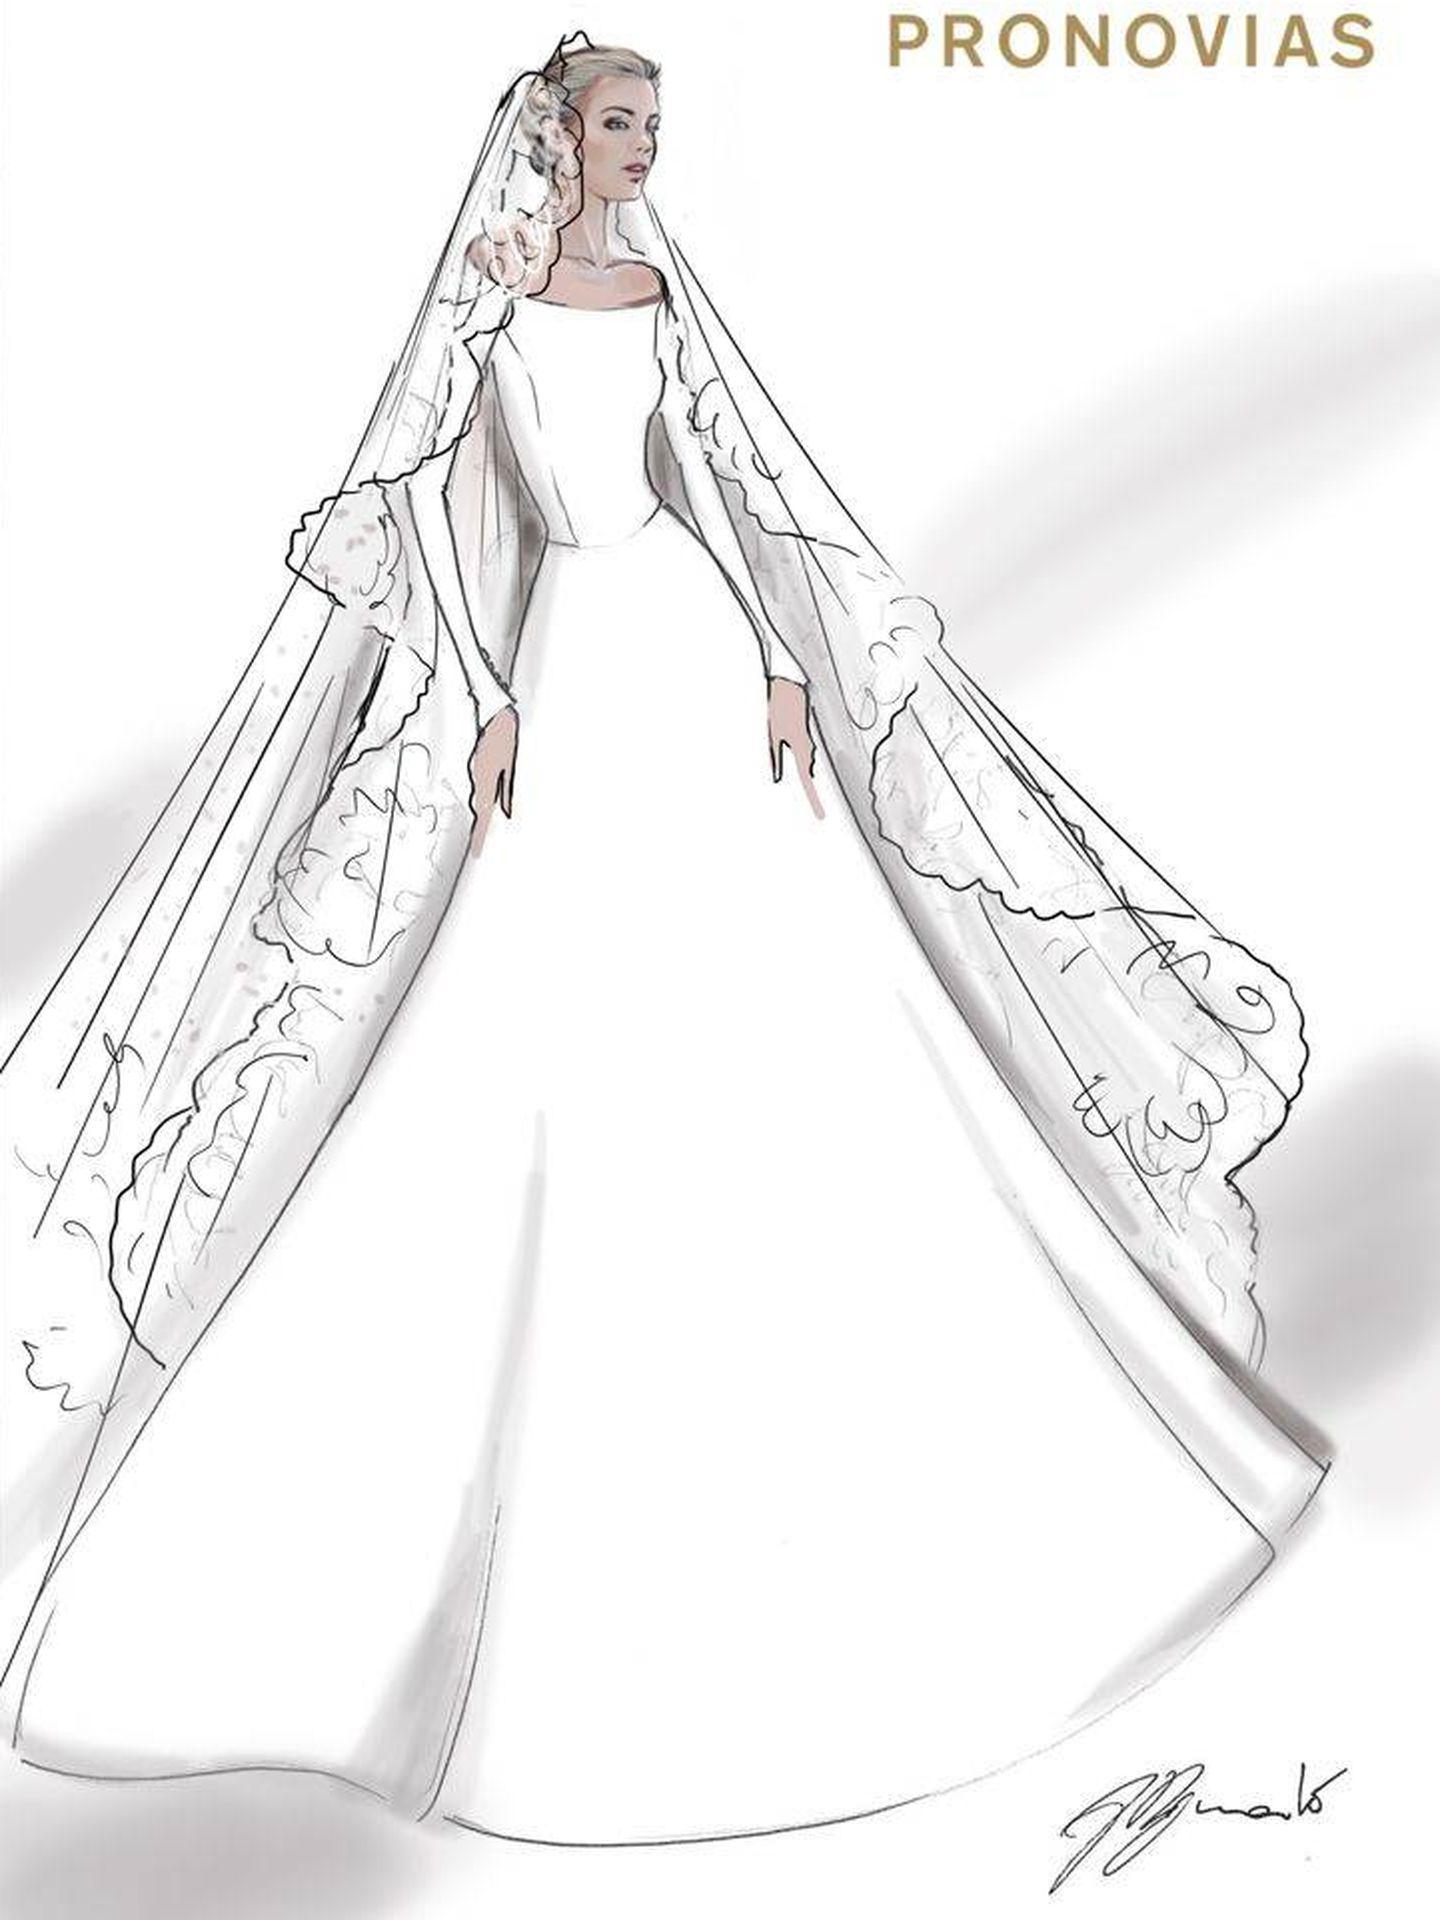 Boceto del vestido para la ceremonia. (Pronovias)